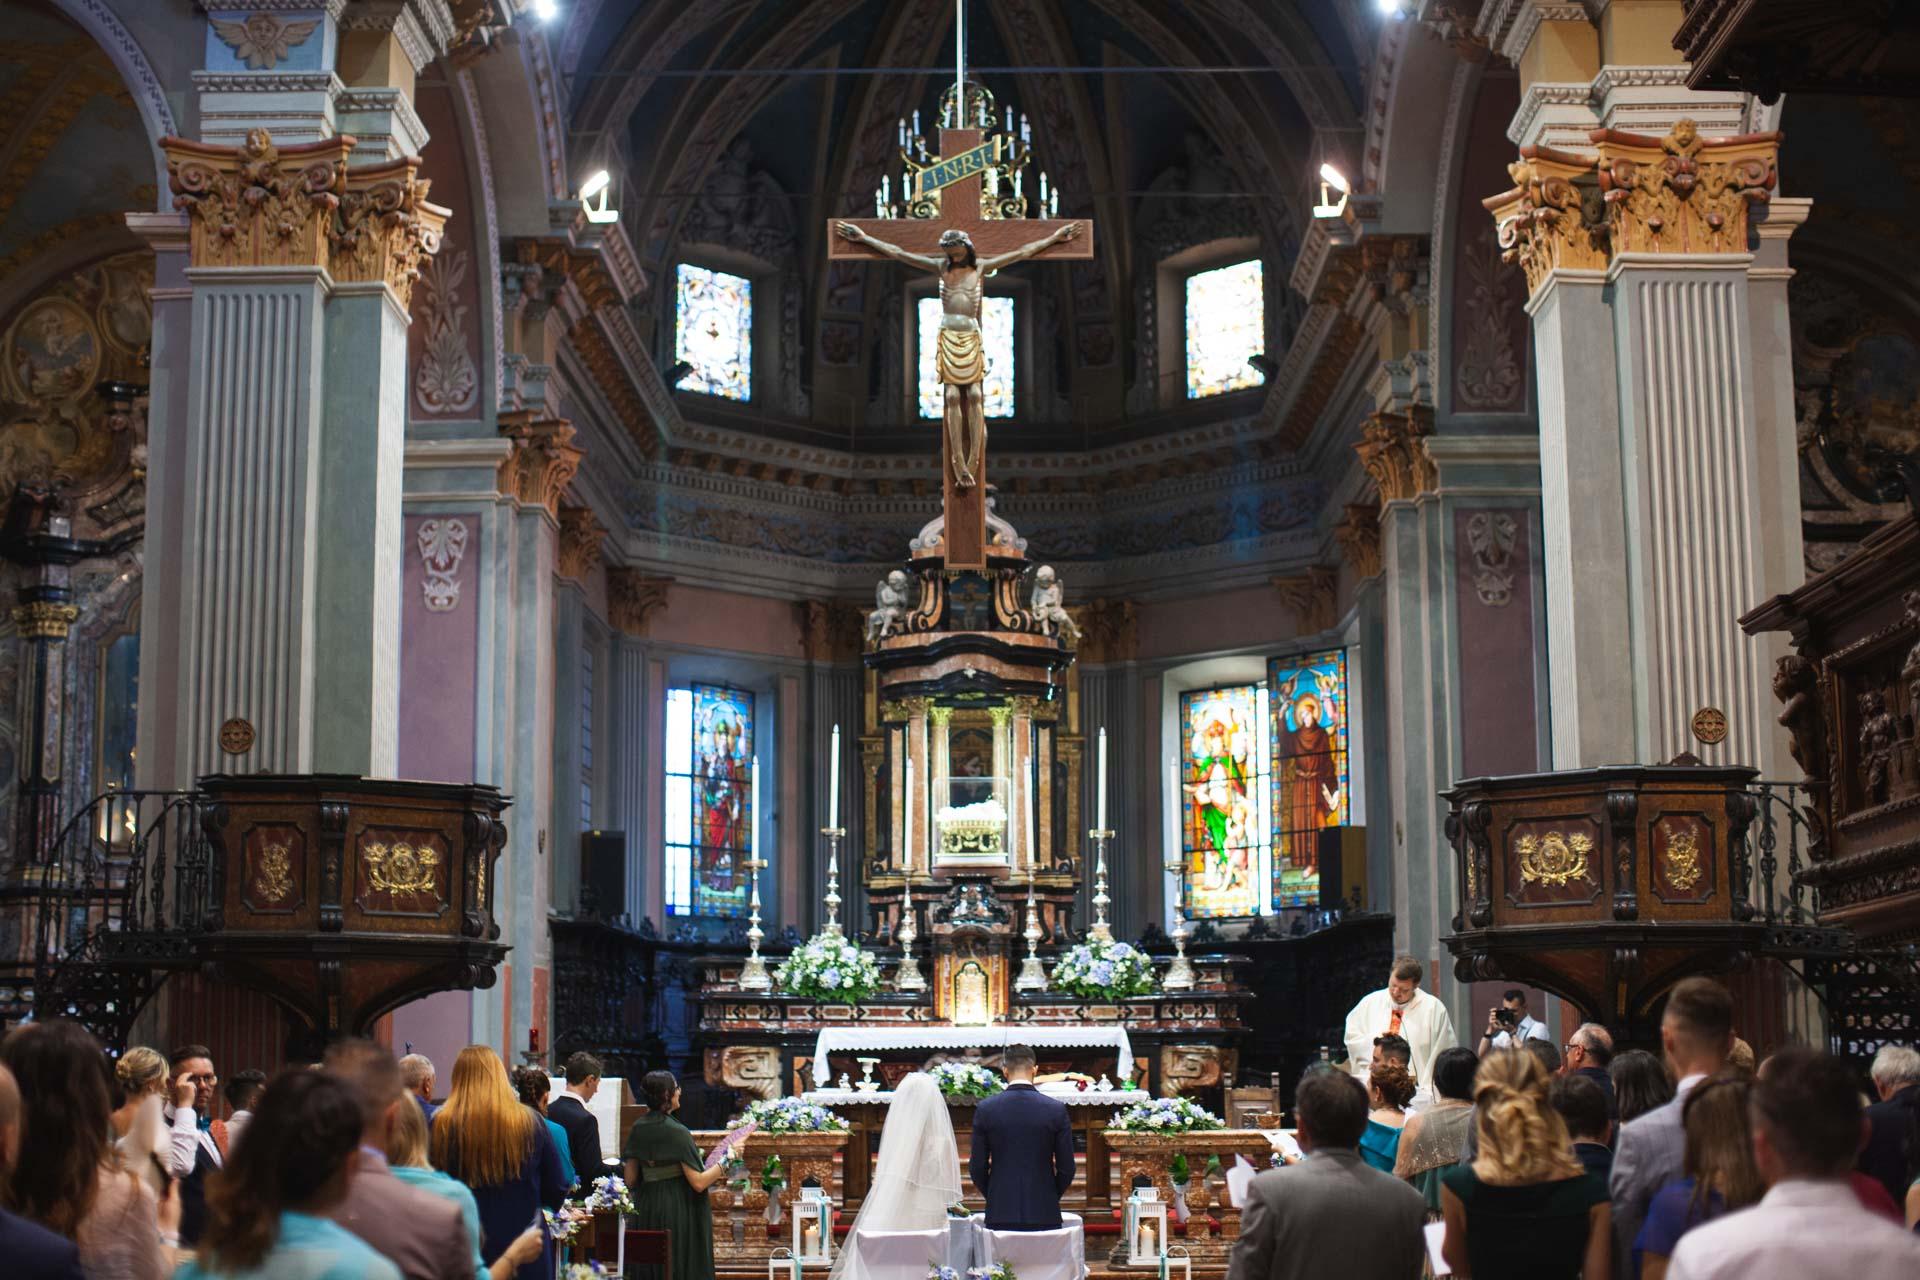 chiesa interno matrimonio sposi invitati